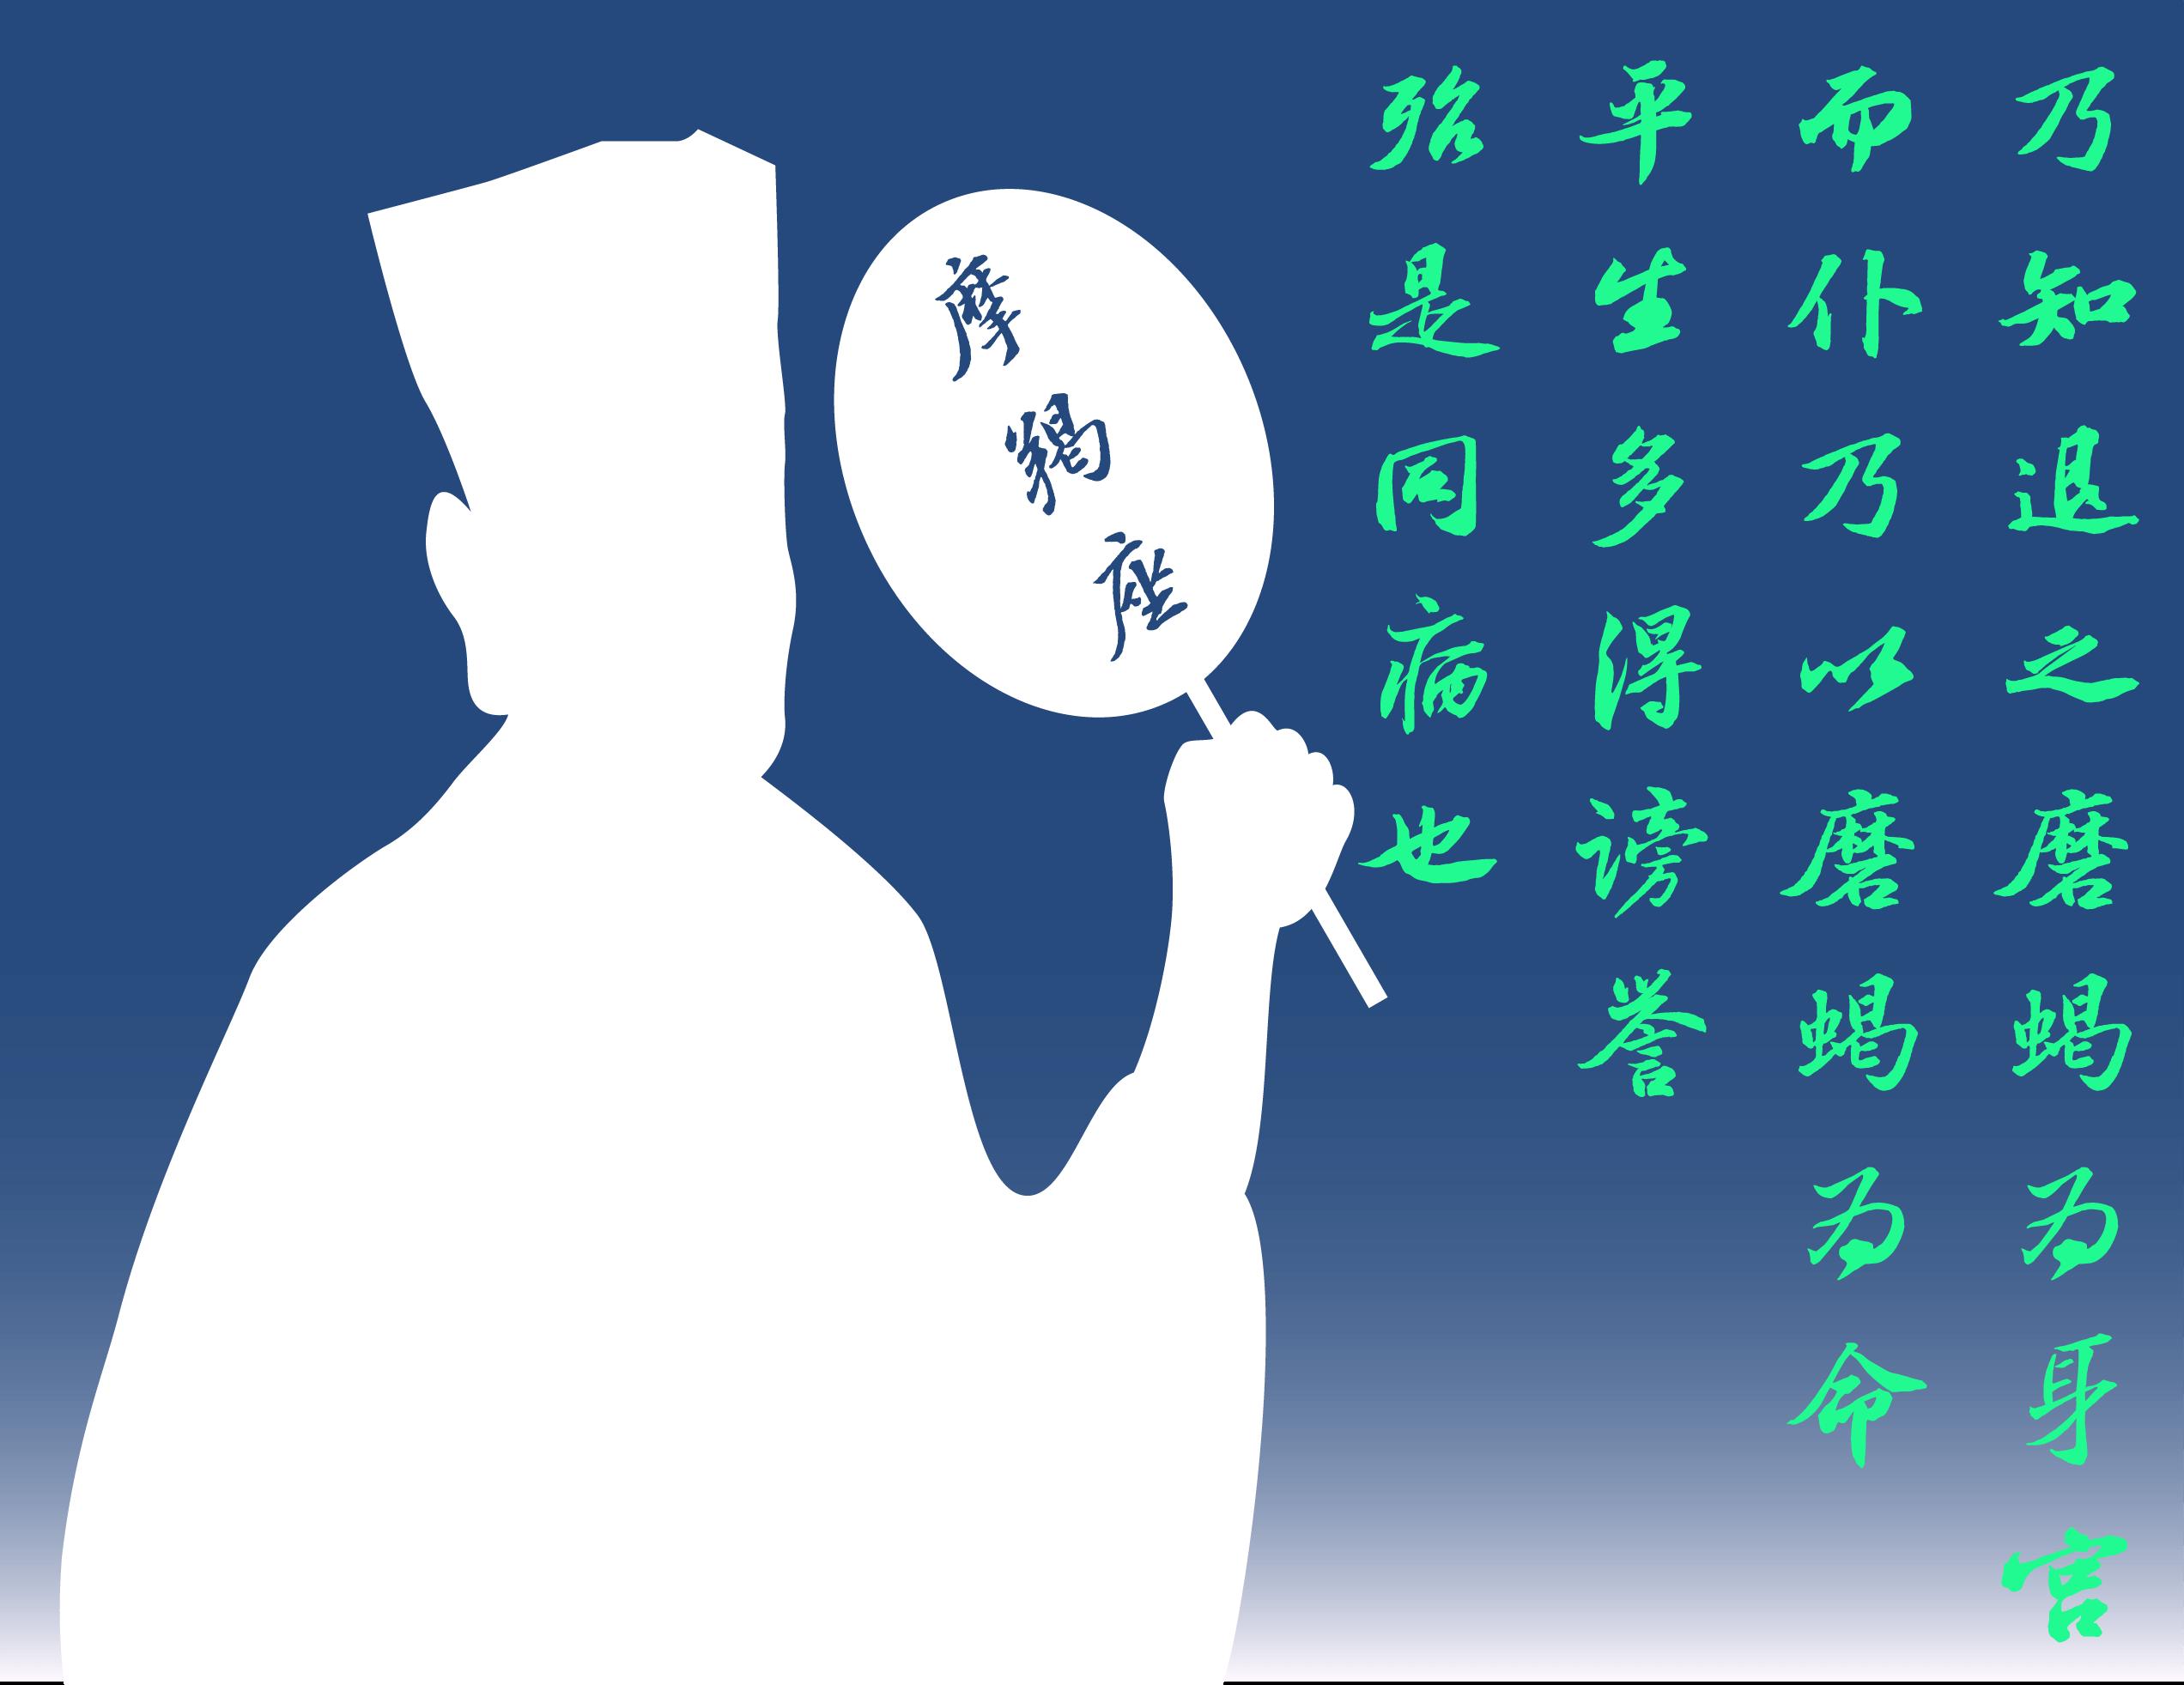 https://cdn1.zijia.com.cn/Public/Uploads/mainsort/mainsort_1602817390_3924.png